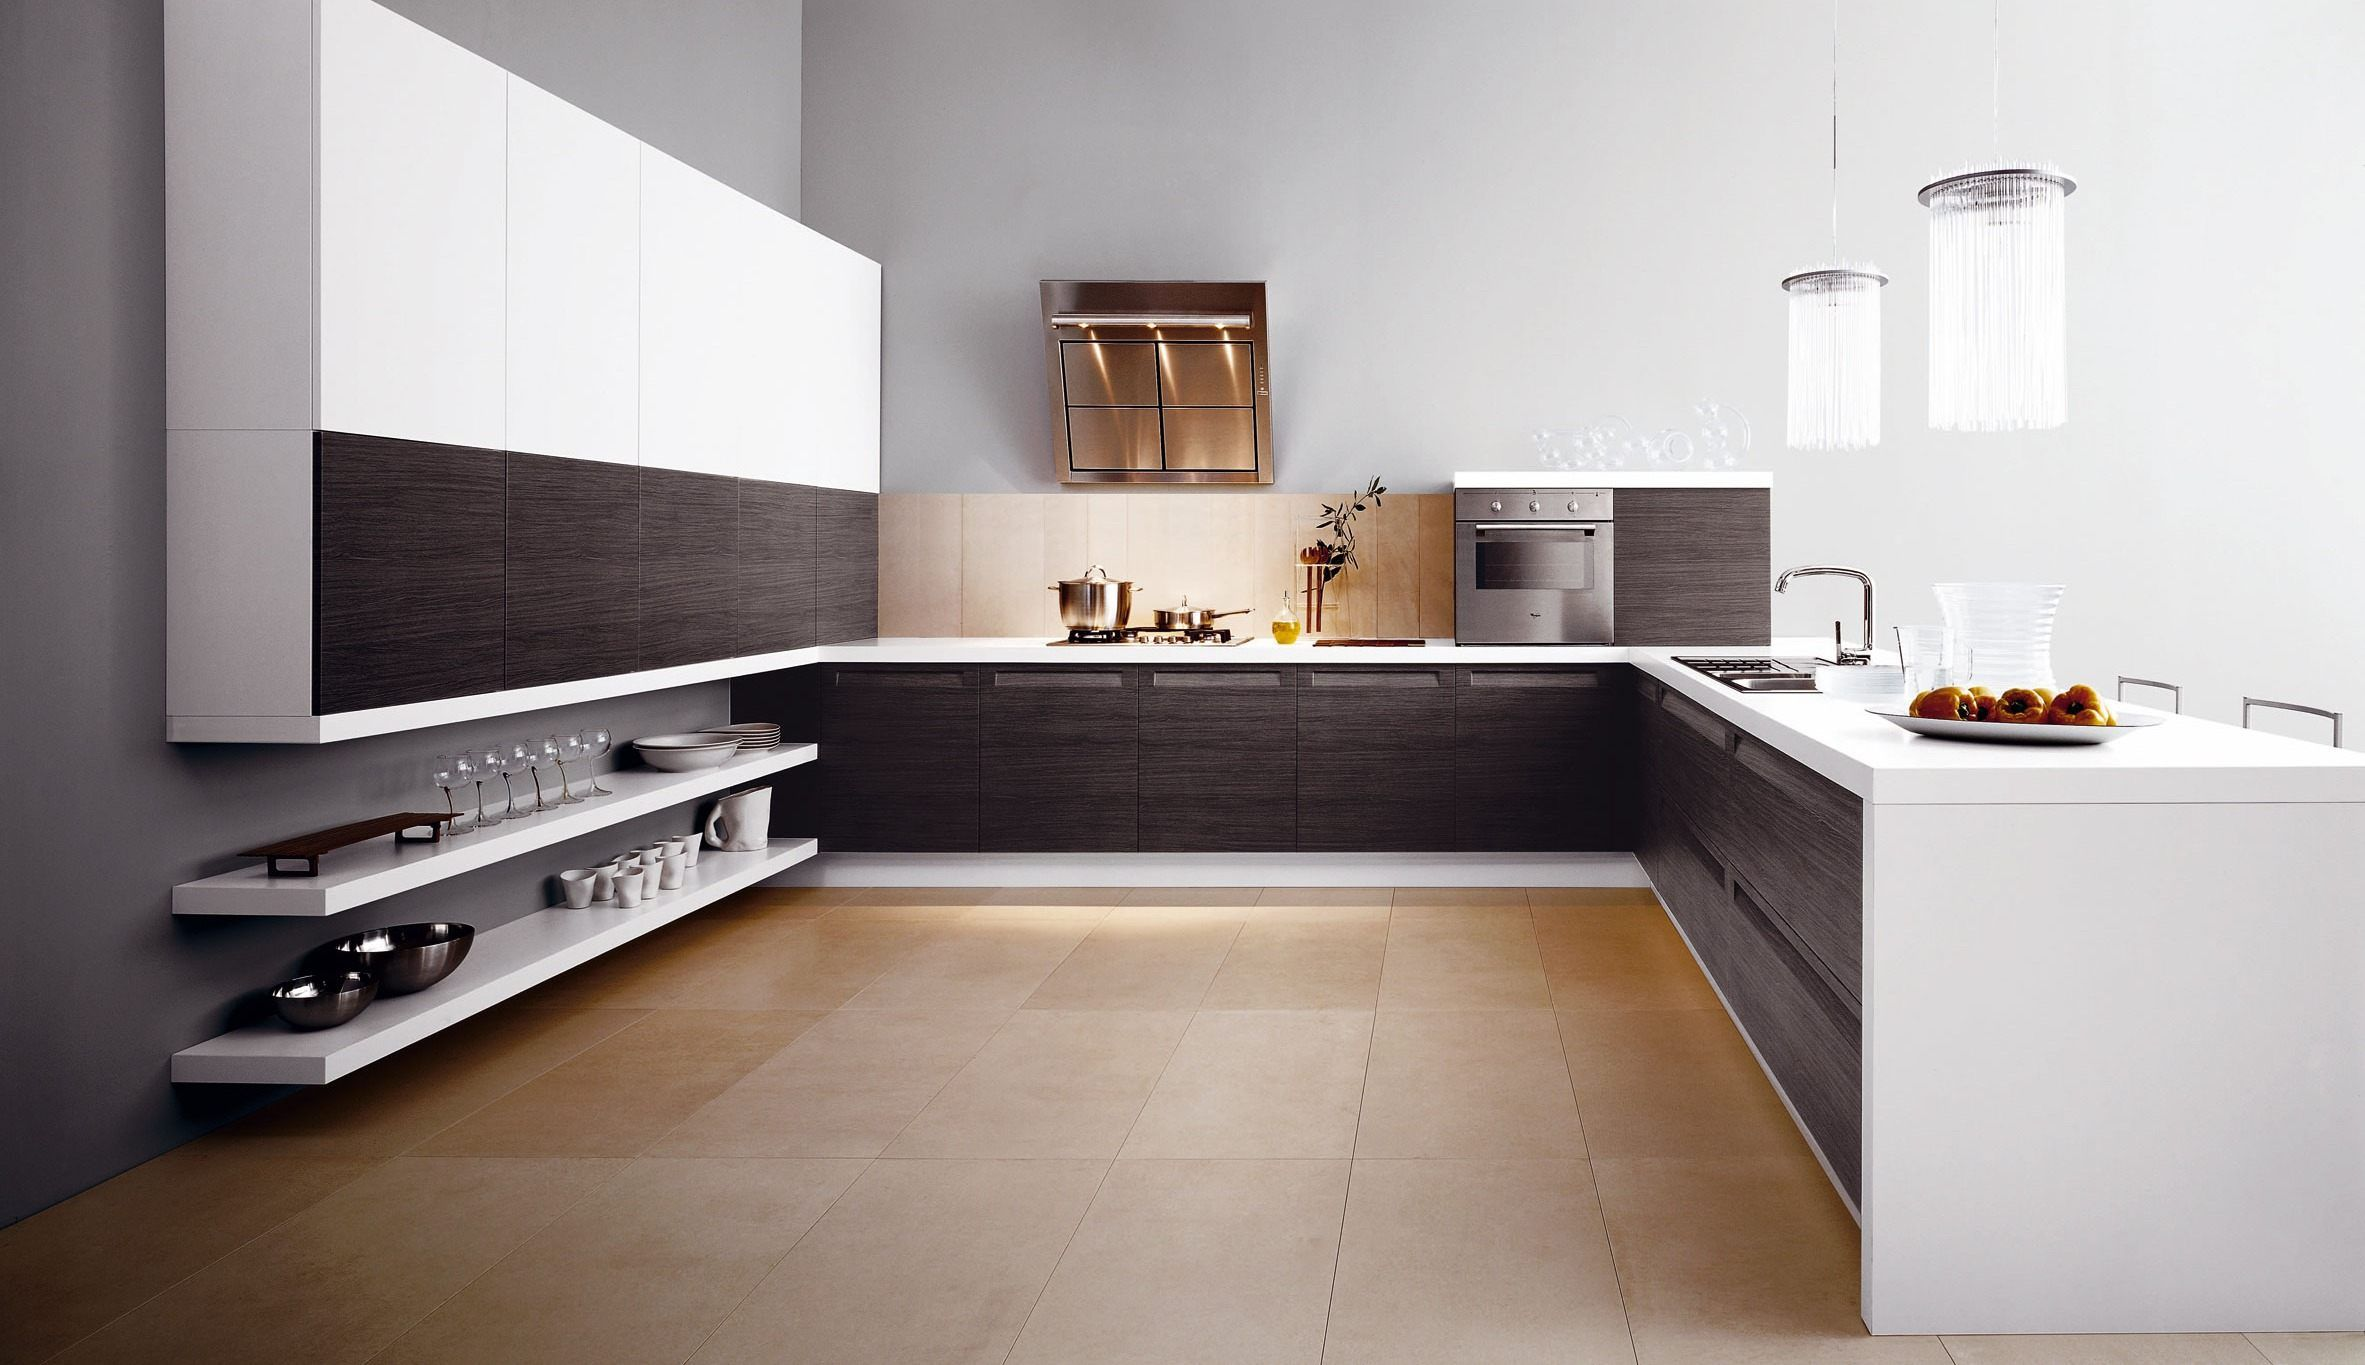 Contemporaine Cuisine Design 5  Italian kitchen design, Kitchen